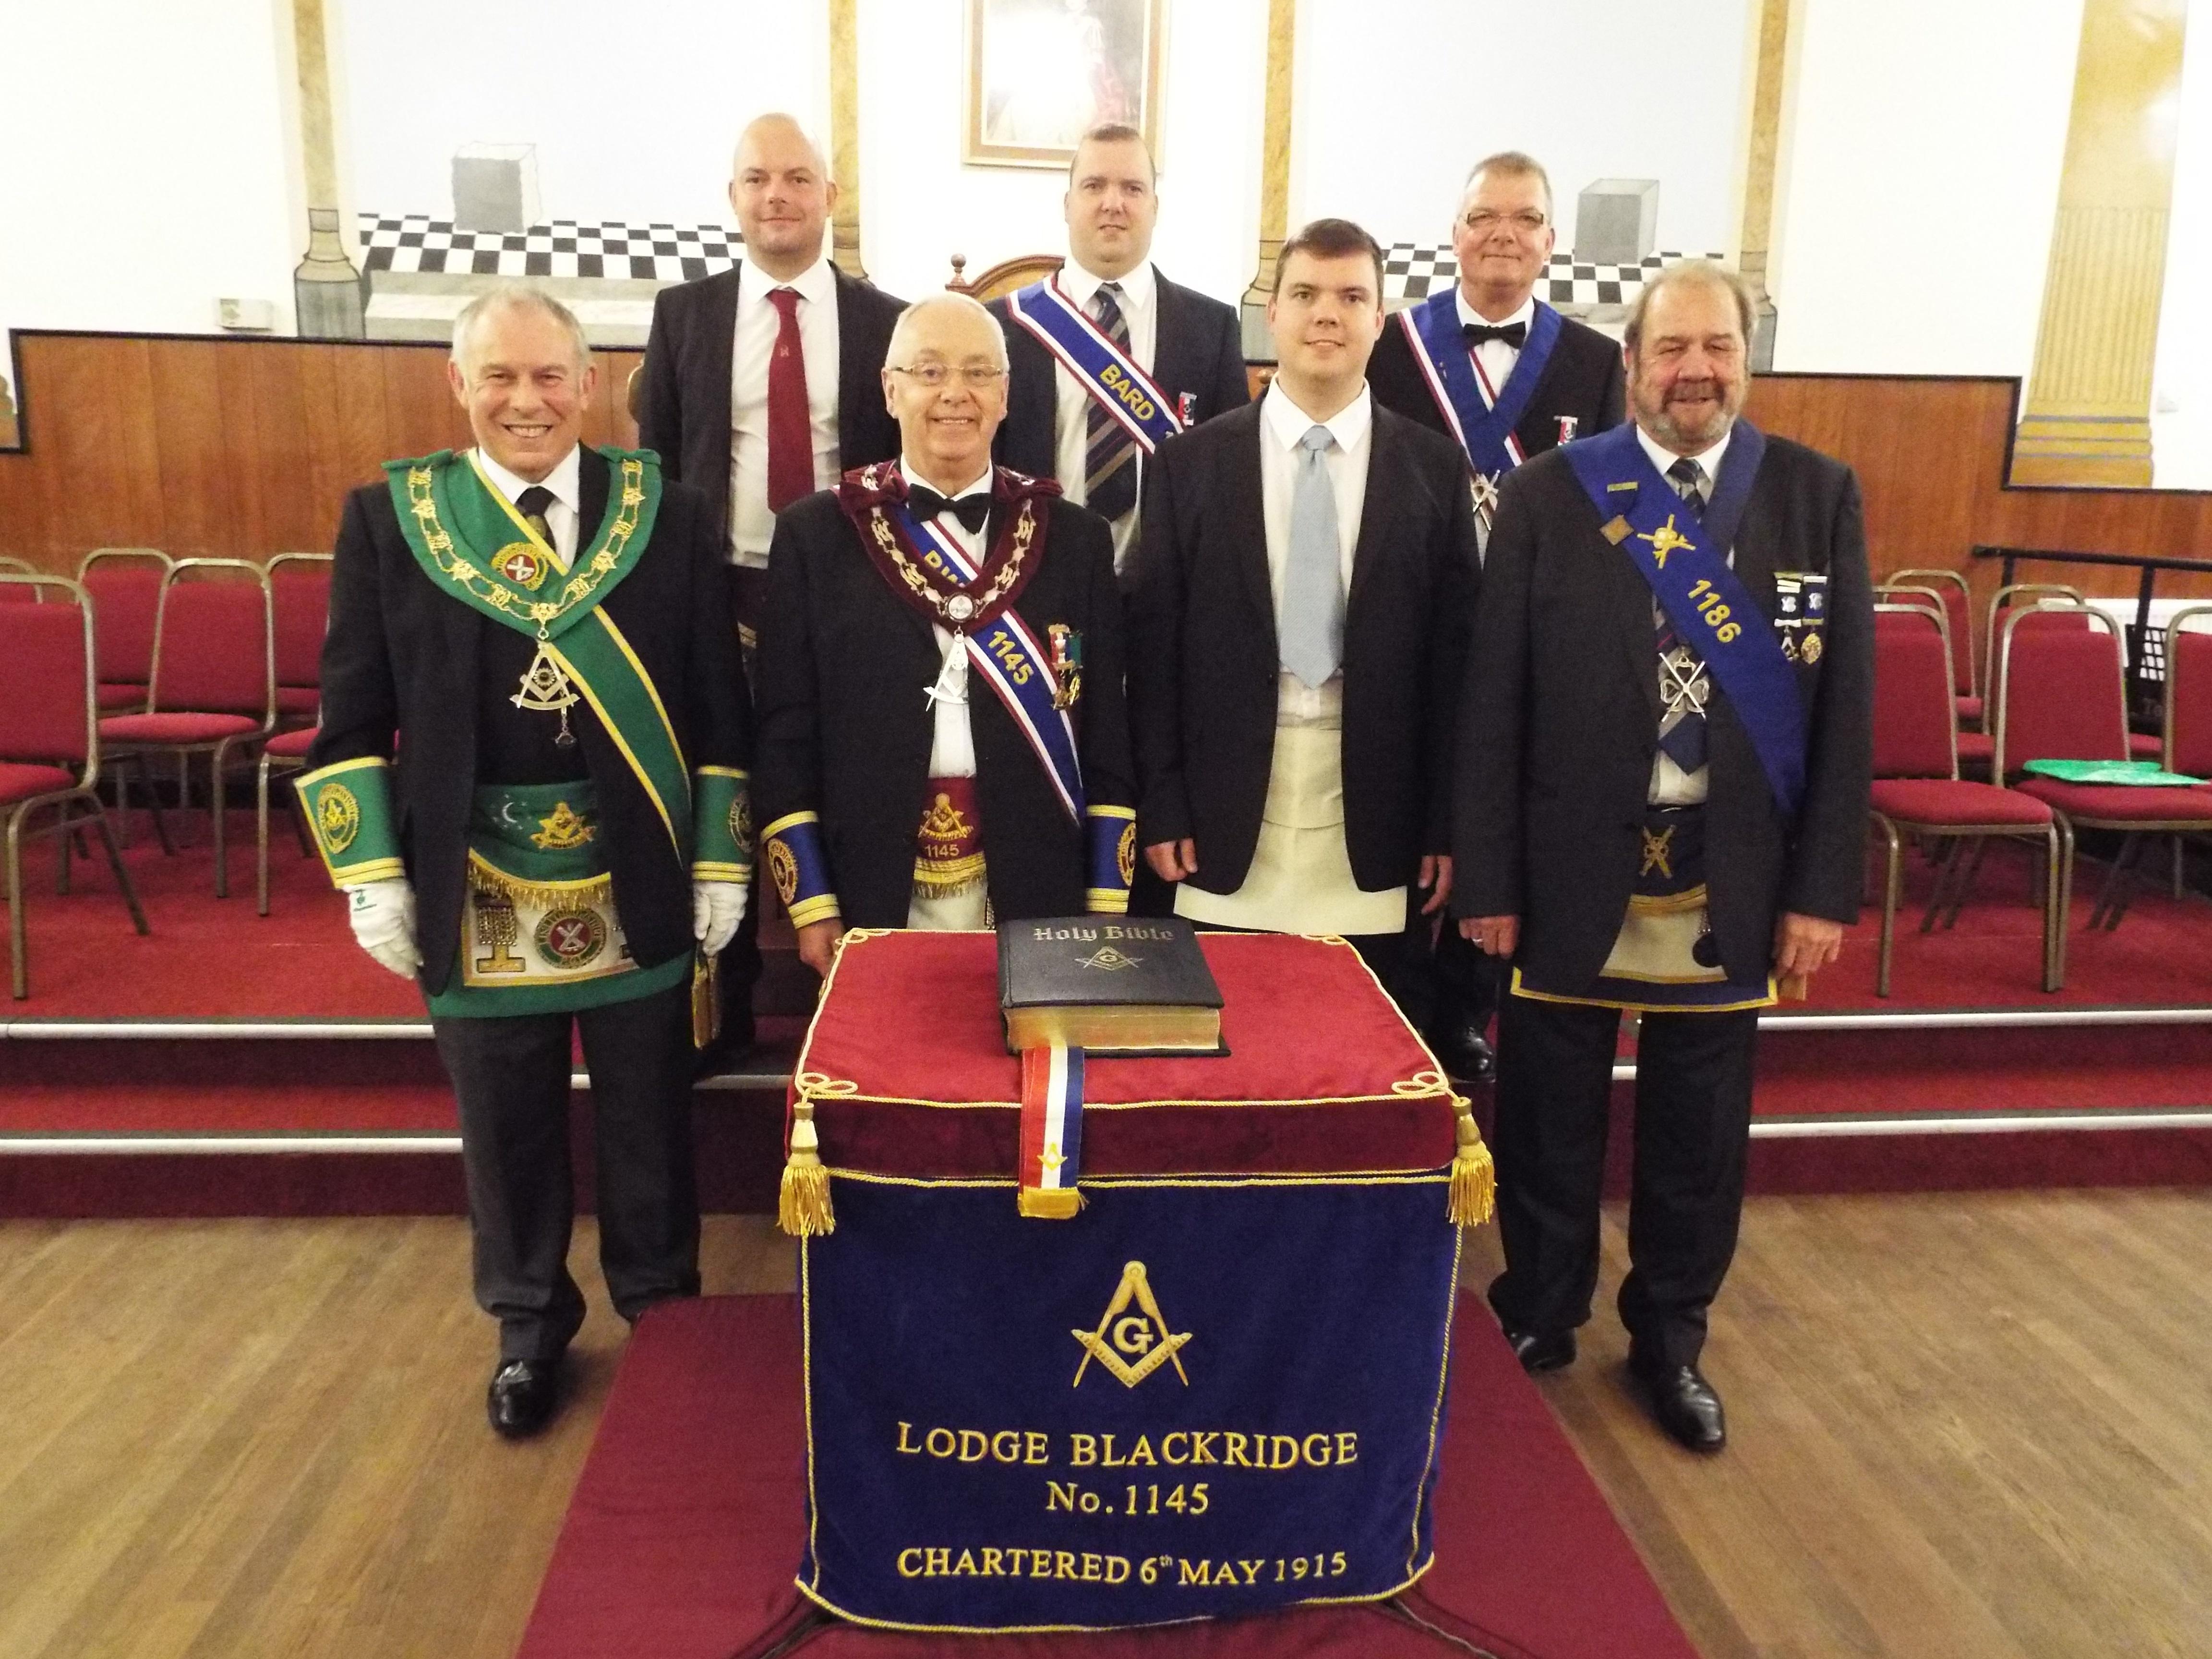 Initiation of Colin Clark at Lodge Blackridge 1145 27 Sep 2016